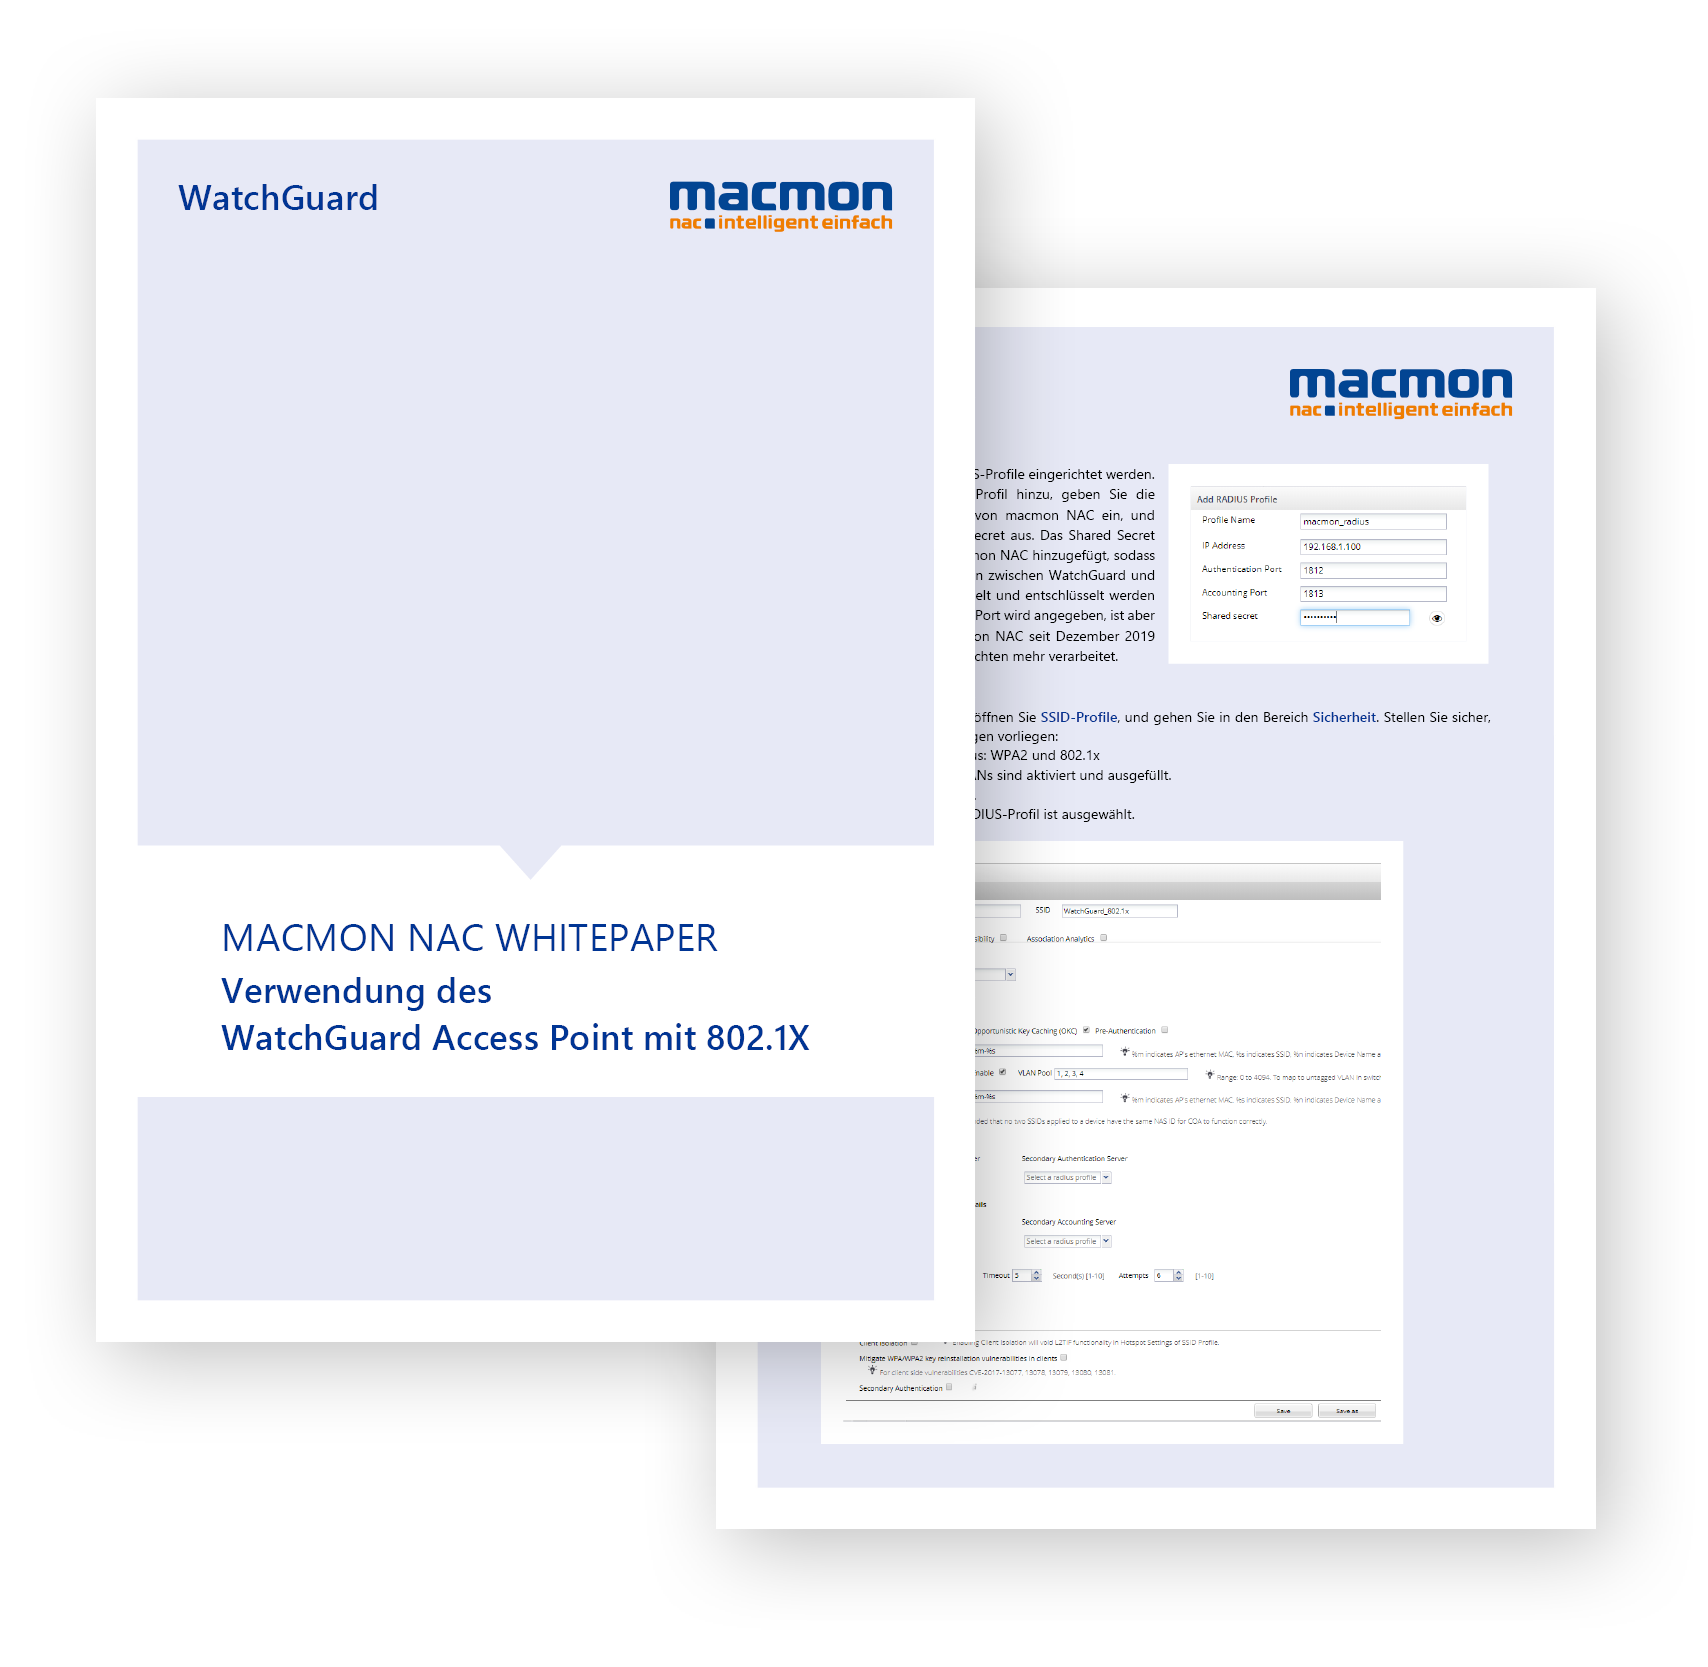 macmon_web_whitepaper_Grafiken_watchguard